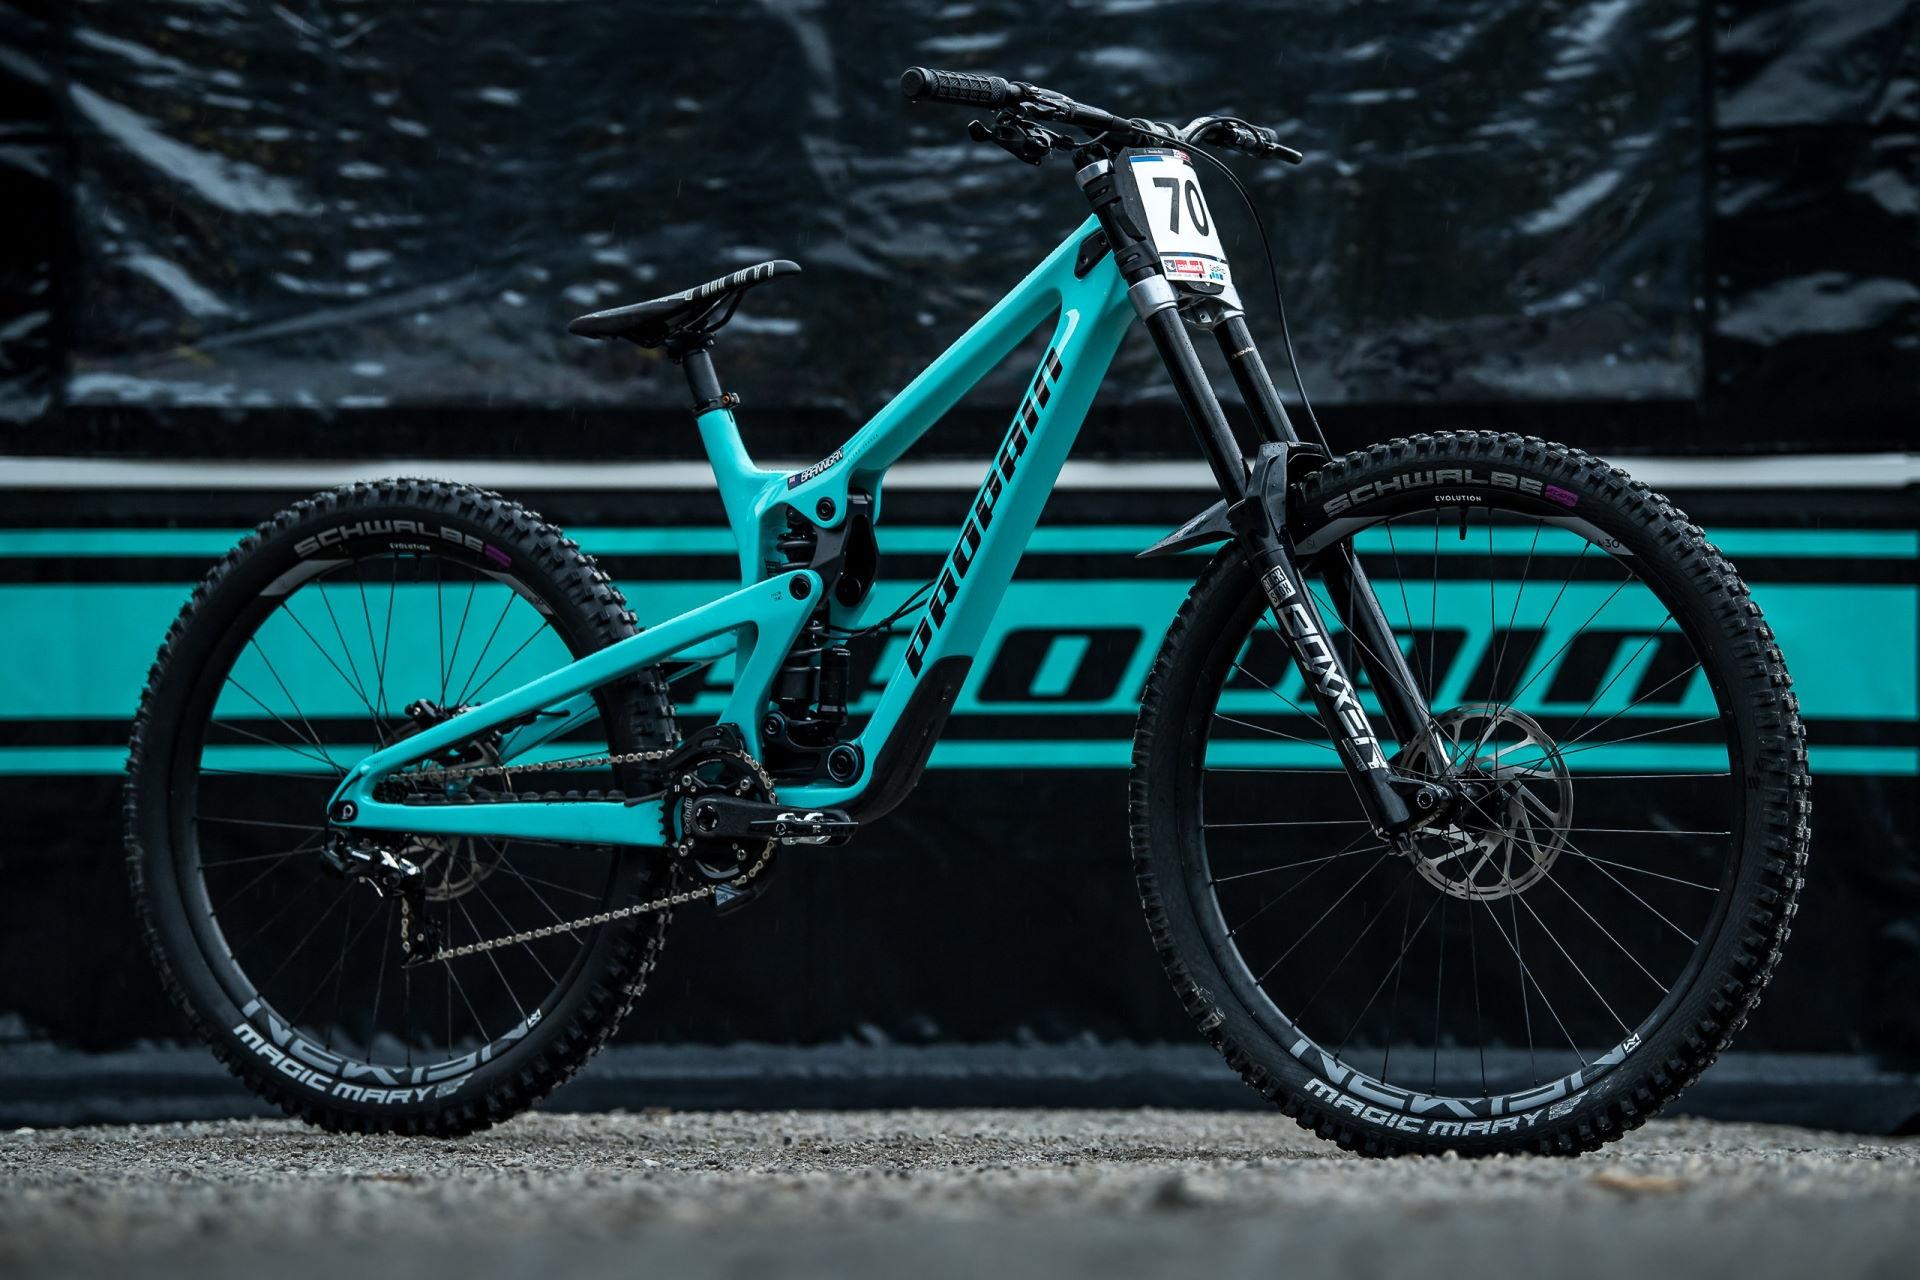 PROPAIN-Rage-CF-MY2021-Leogang-WC-Bike-Still-Pit-462